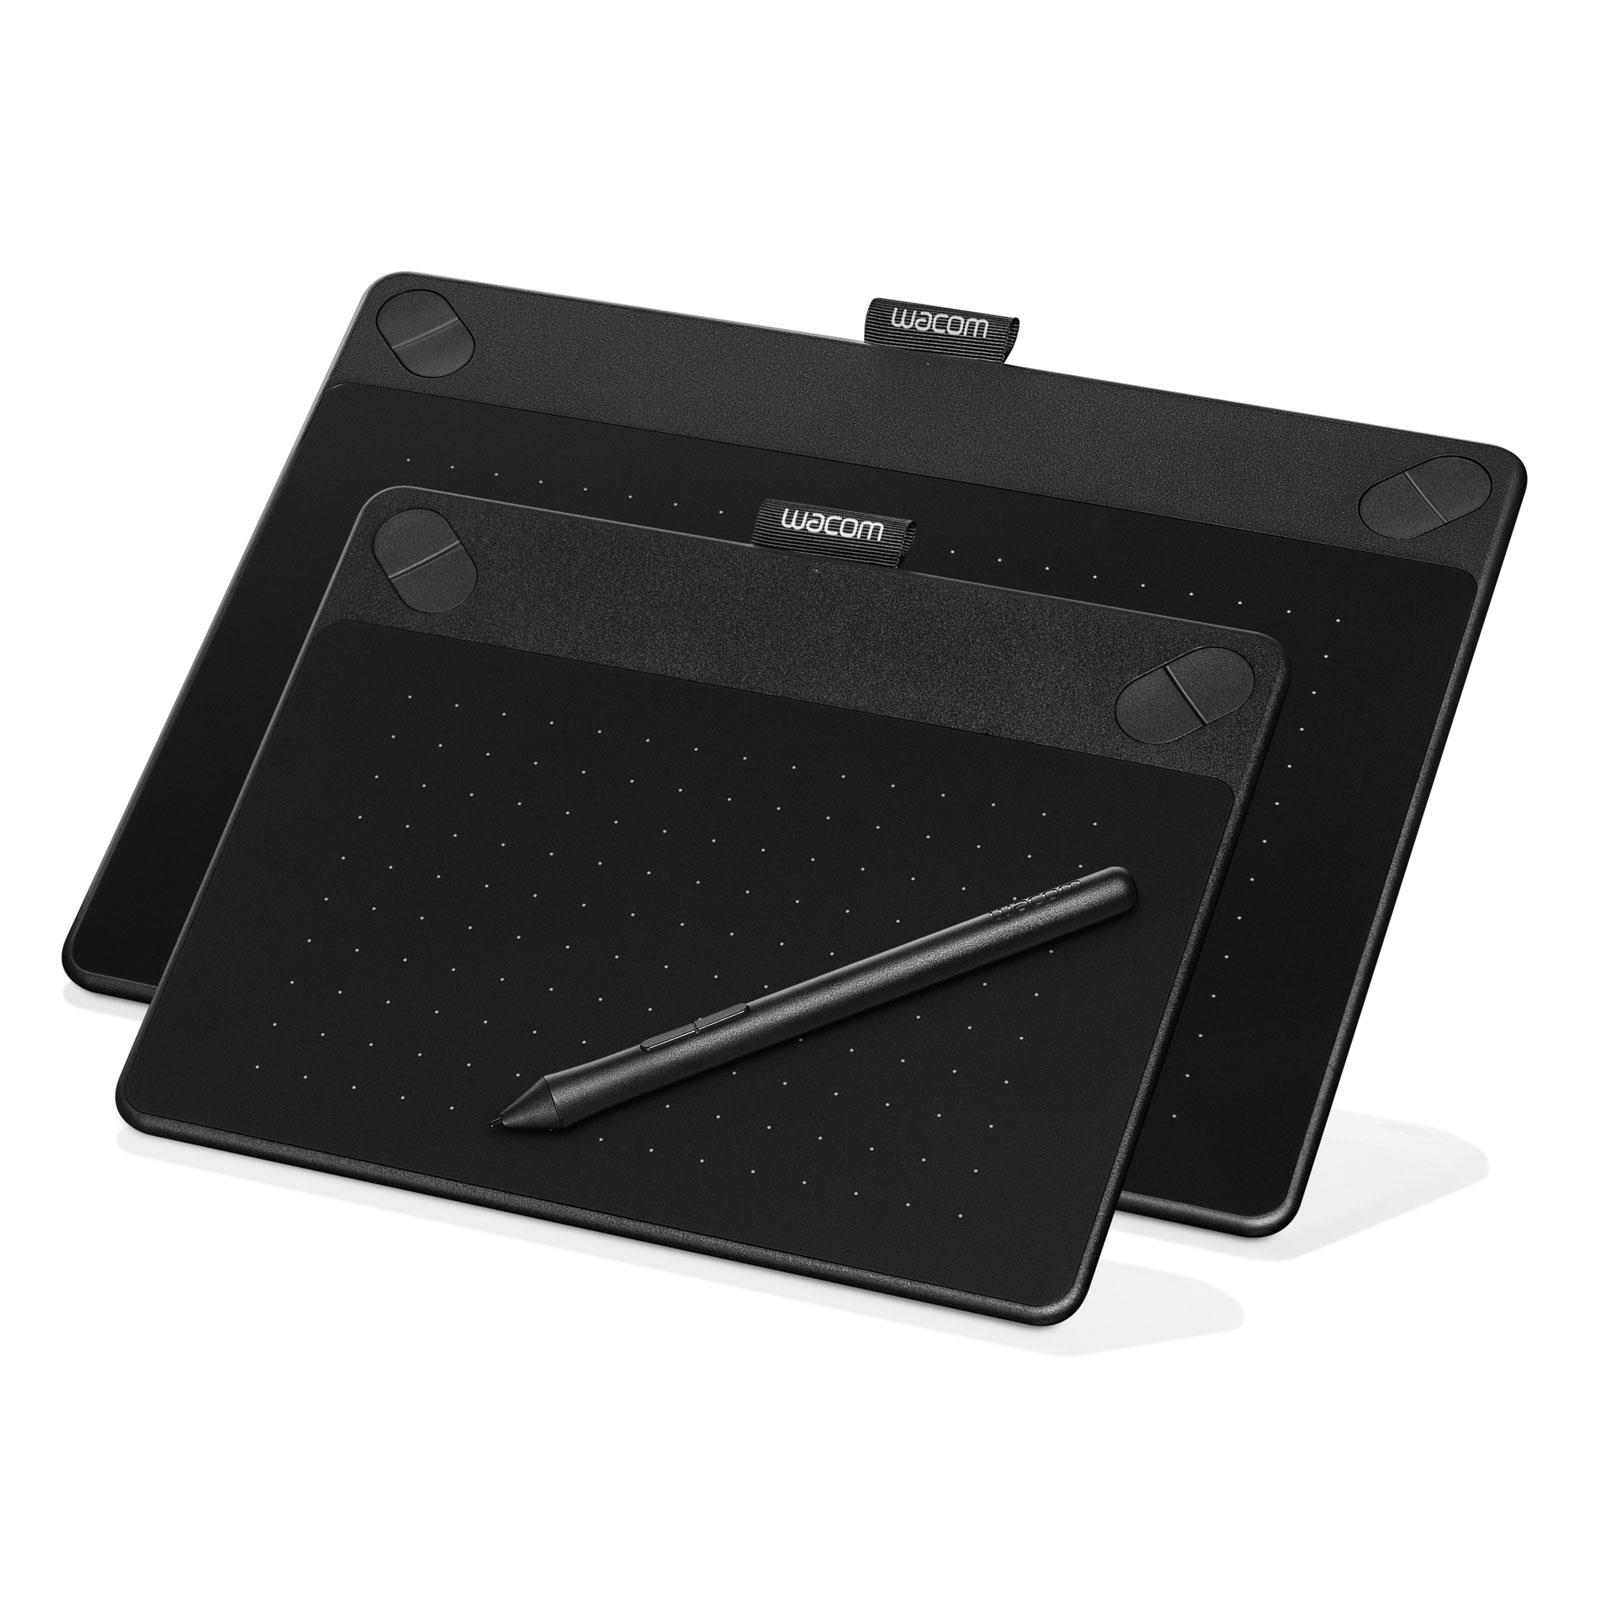 wacom intuos comic small noir tablette graphique wacom sur. Black Bedroom Furniture Sets. Home Design Ideas